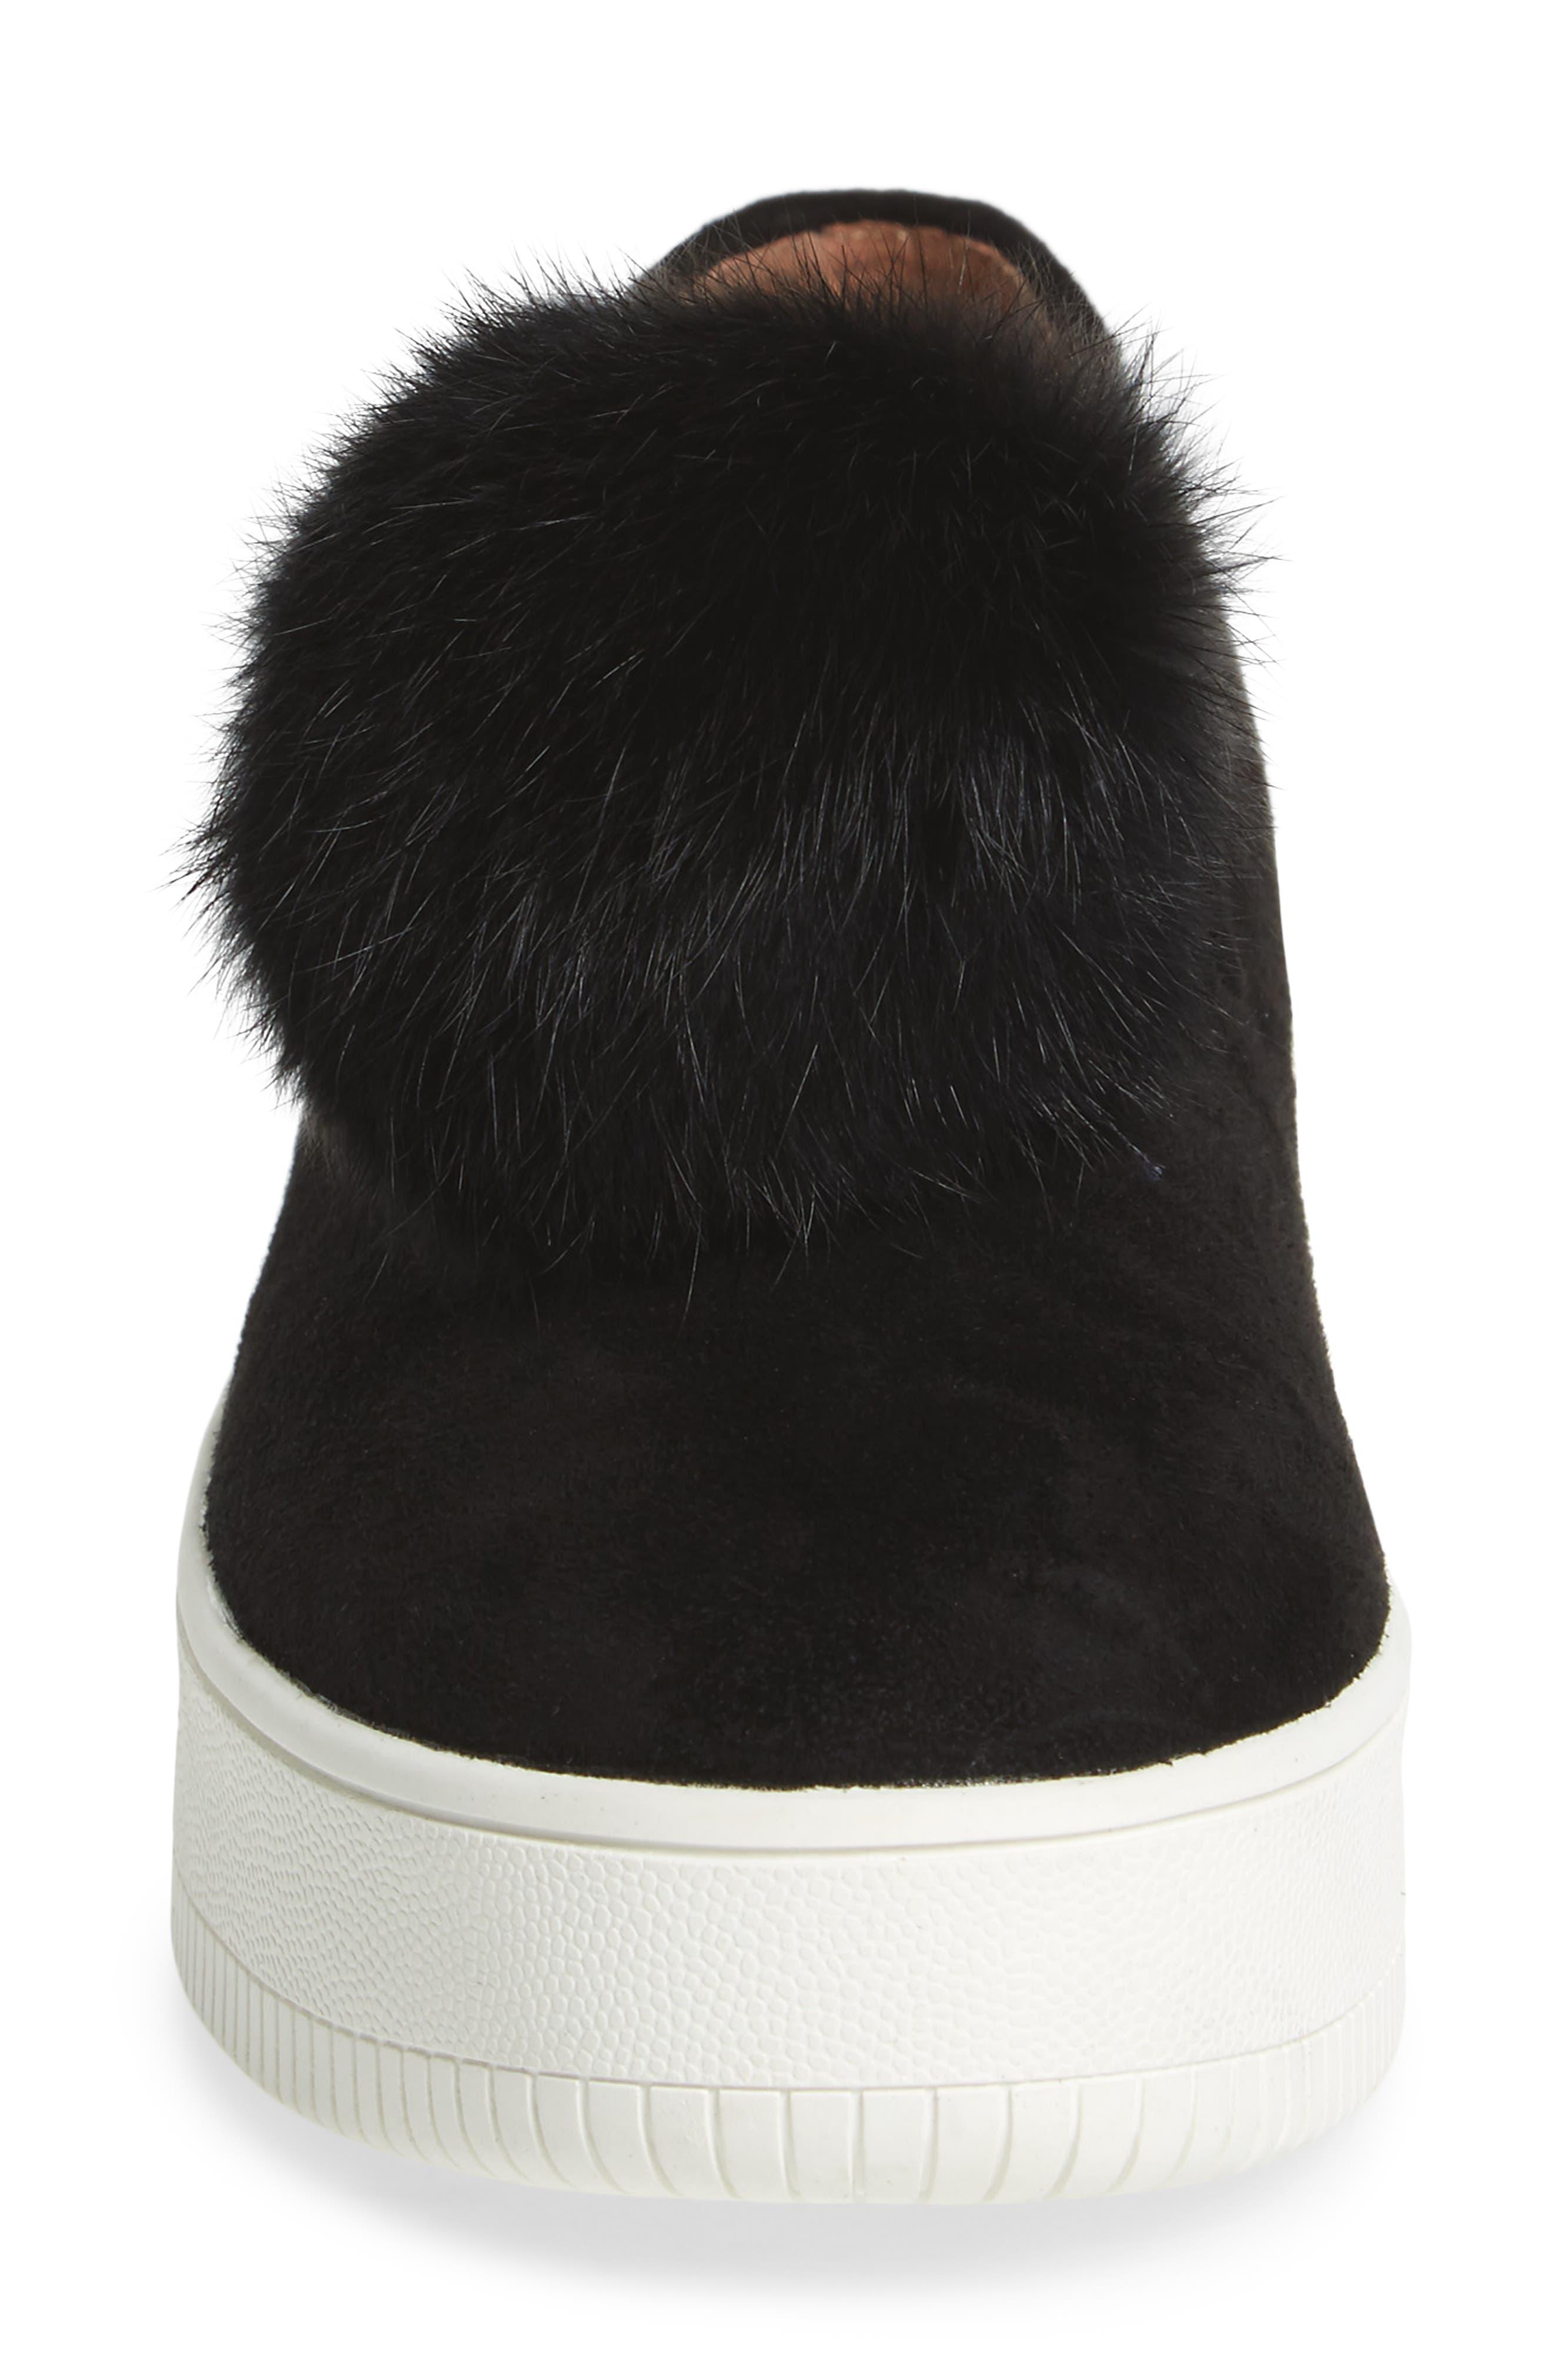 Sammy Platform Sneaker with Genuine Rabbit Fur Pompom,                             Alternate thumbnail 4, color,                             002